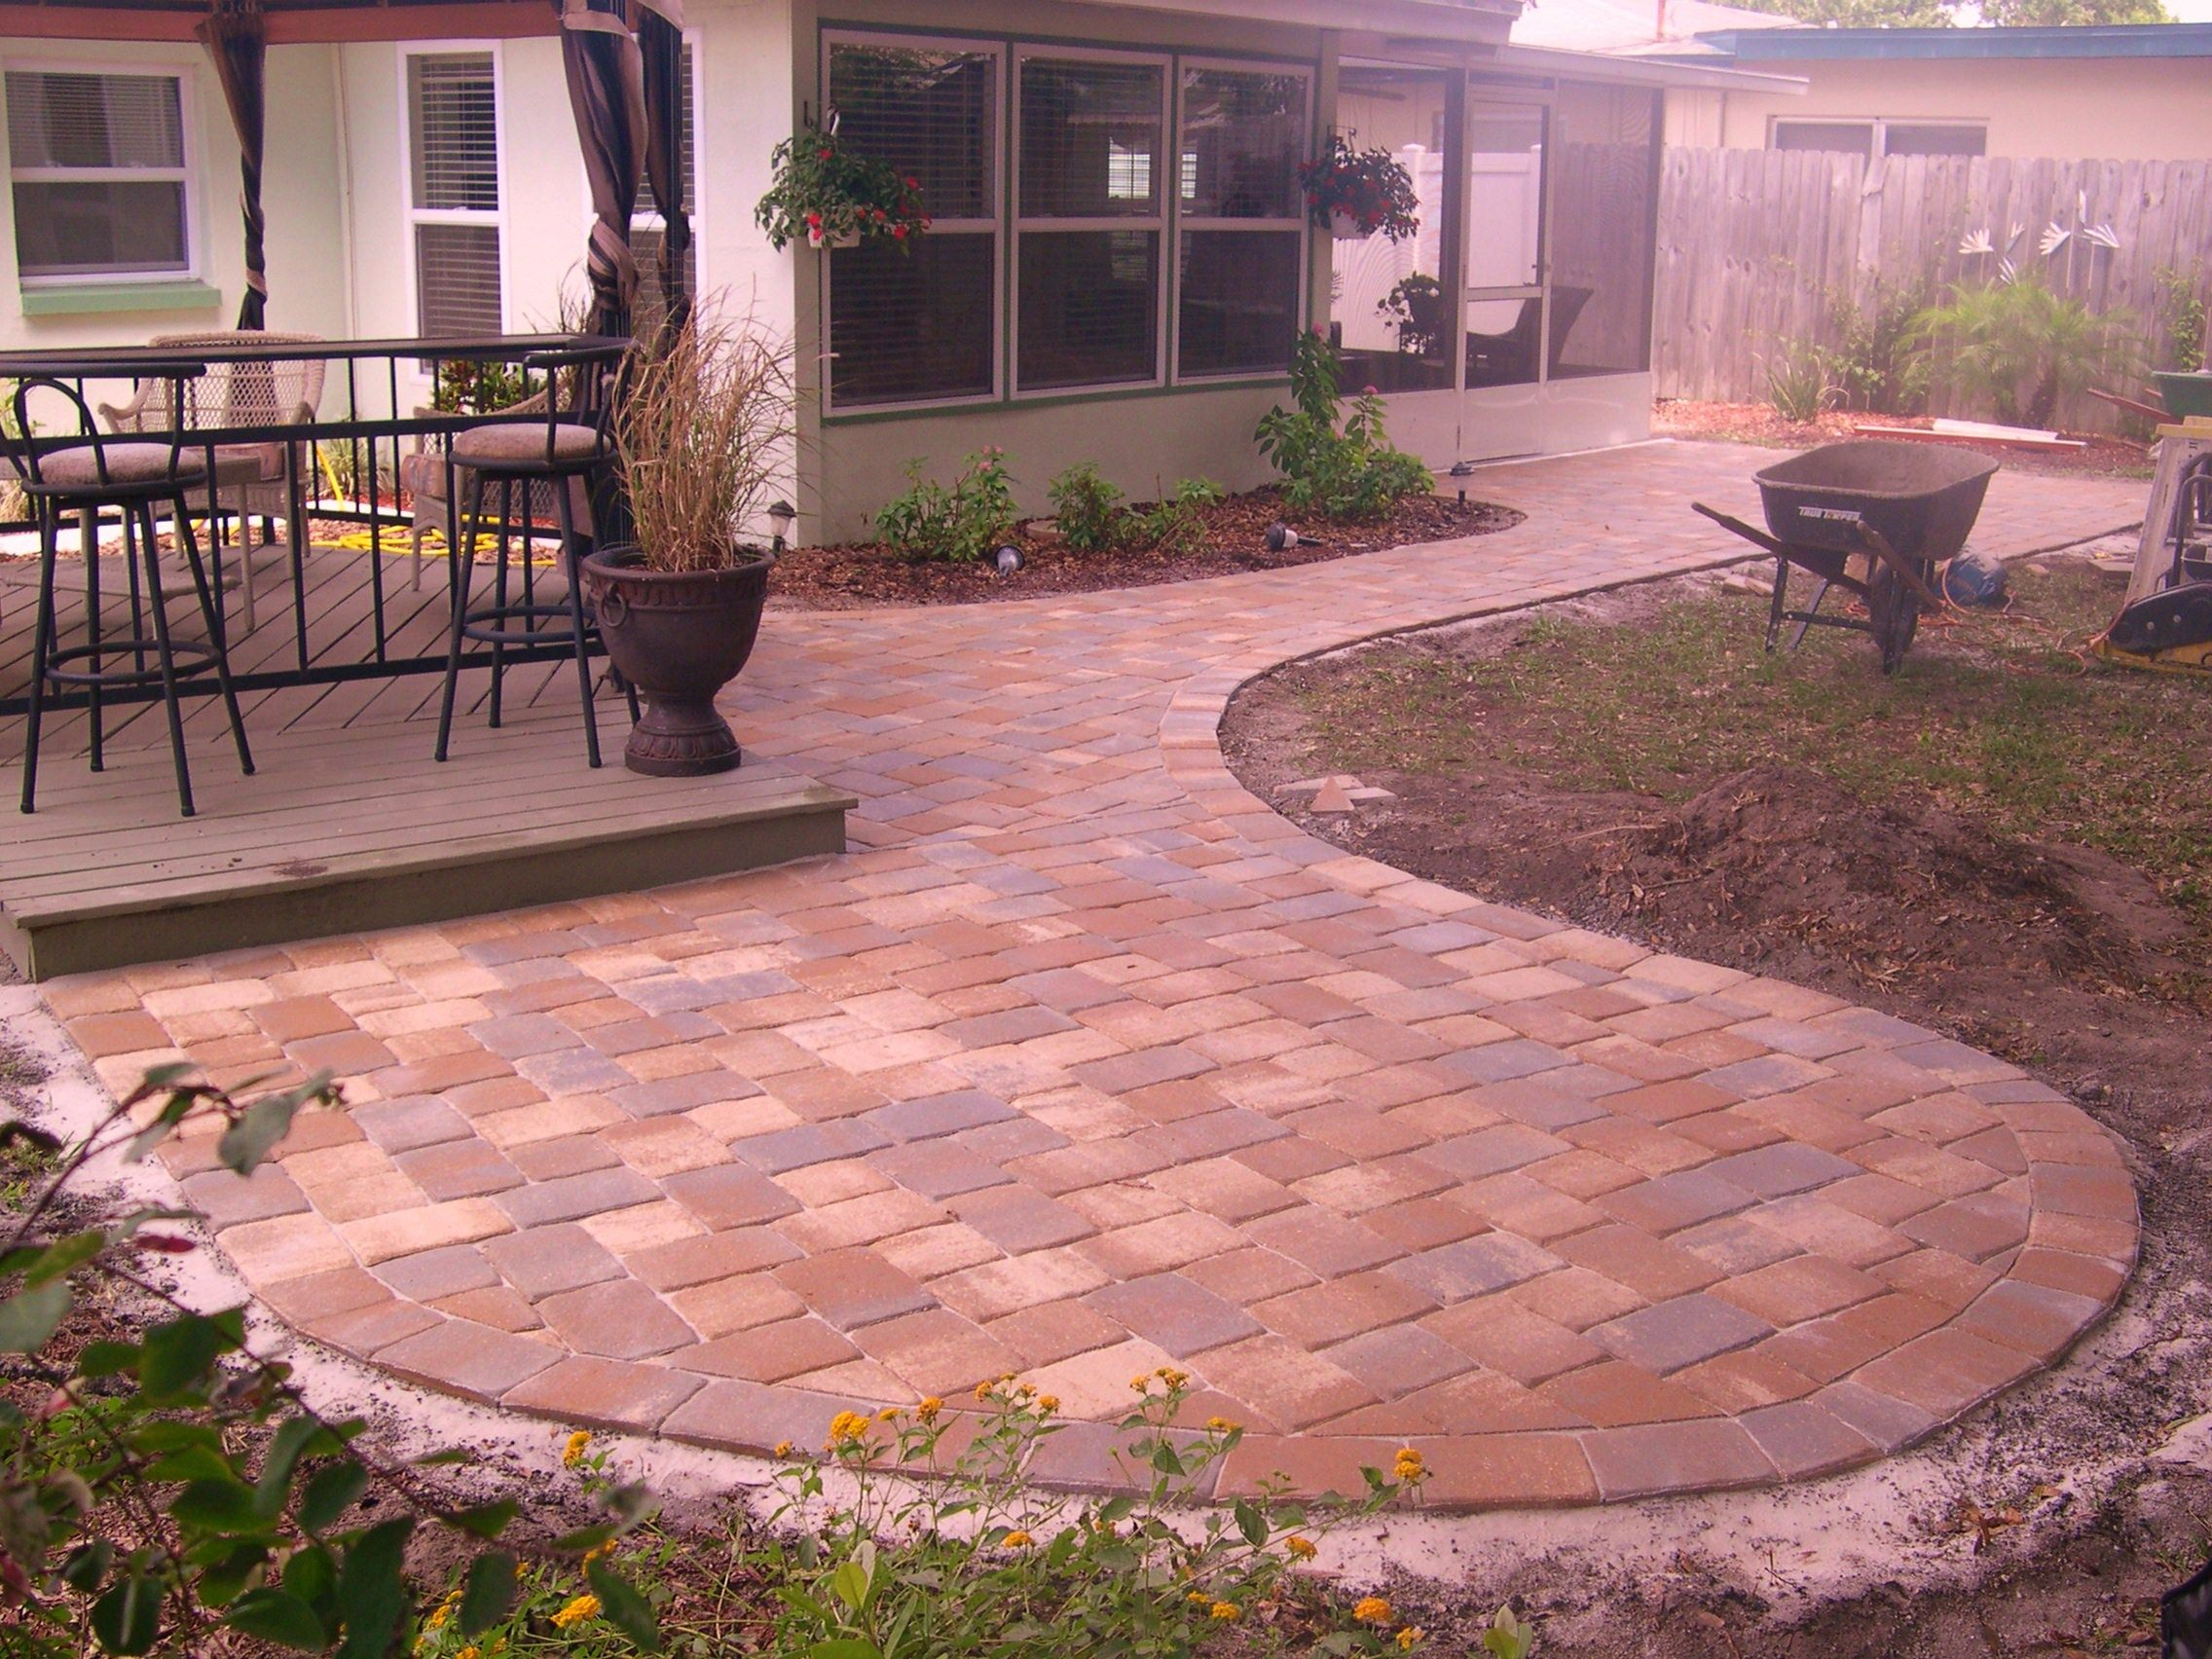 6 Backyard pavers | Backyard pavers, Backyard and Patios on Small Backyard Brick Patio Ideas id=97010